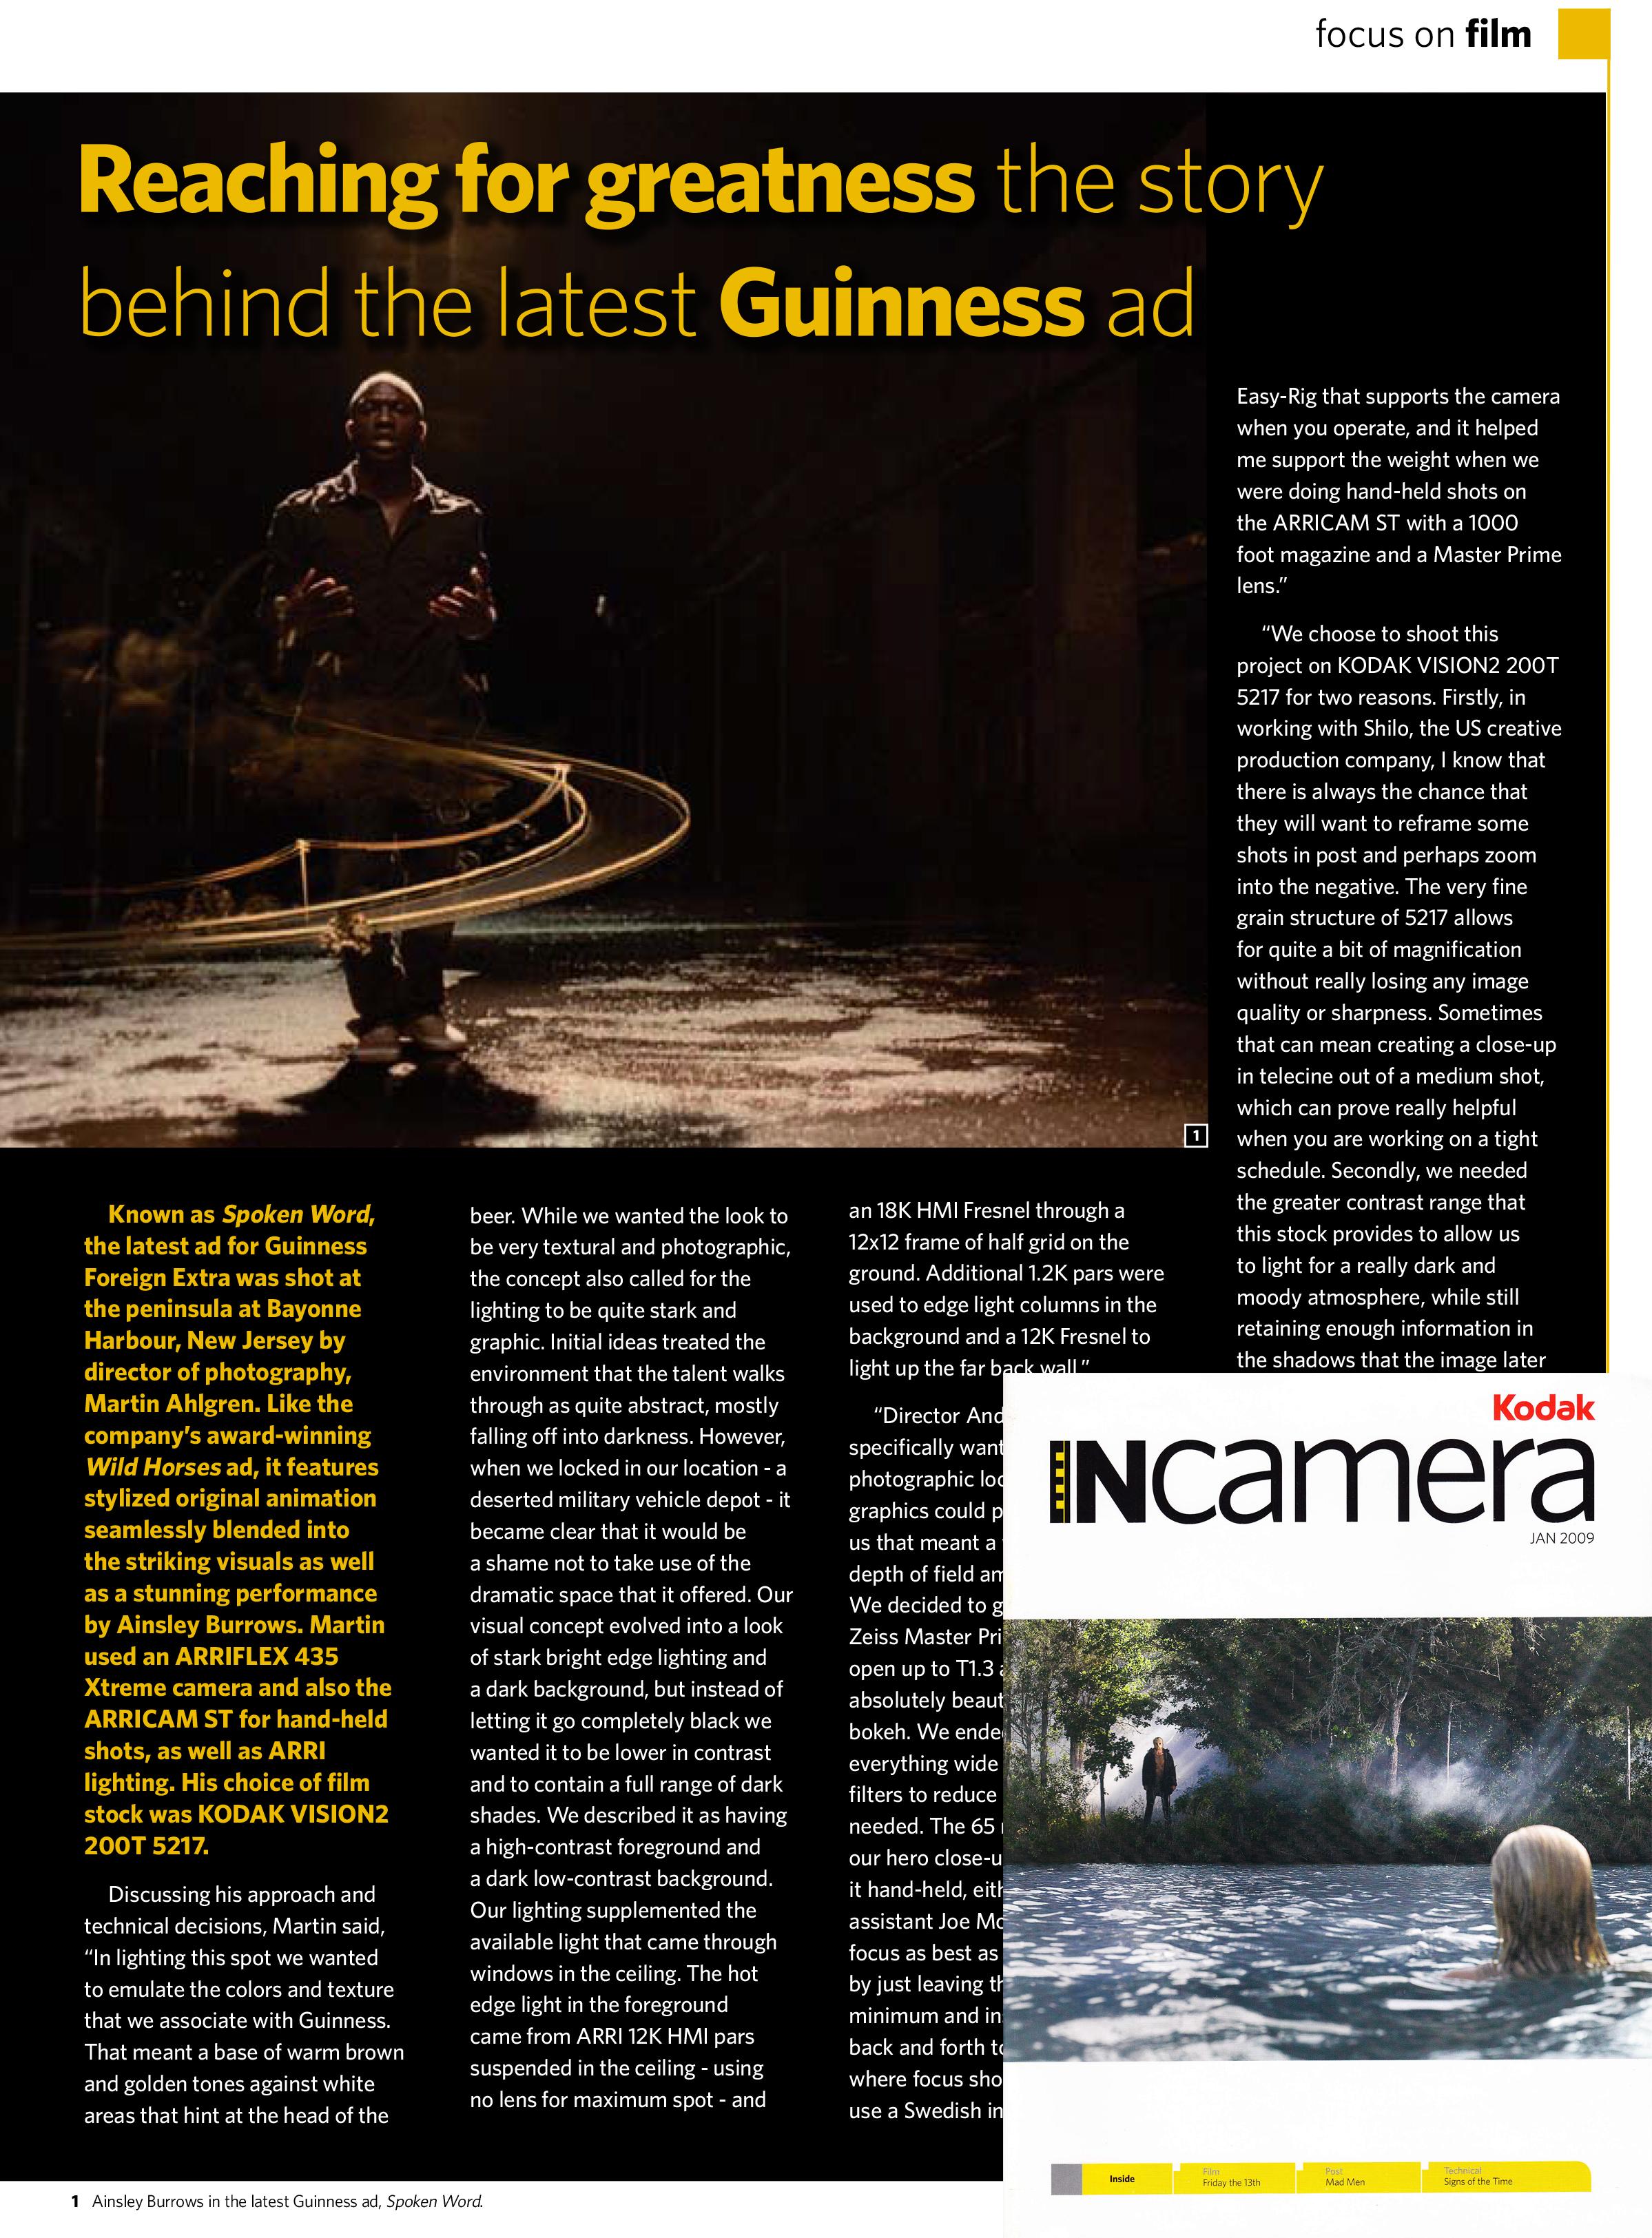 Kodak InCamera Magazine - Jan 2009